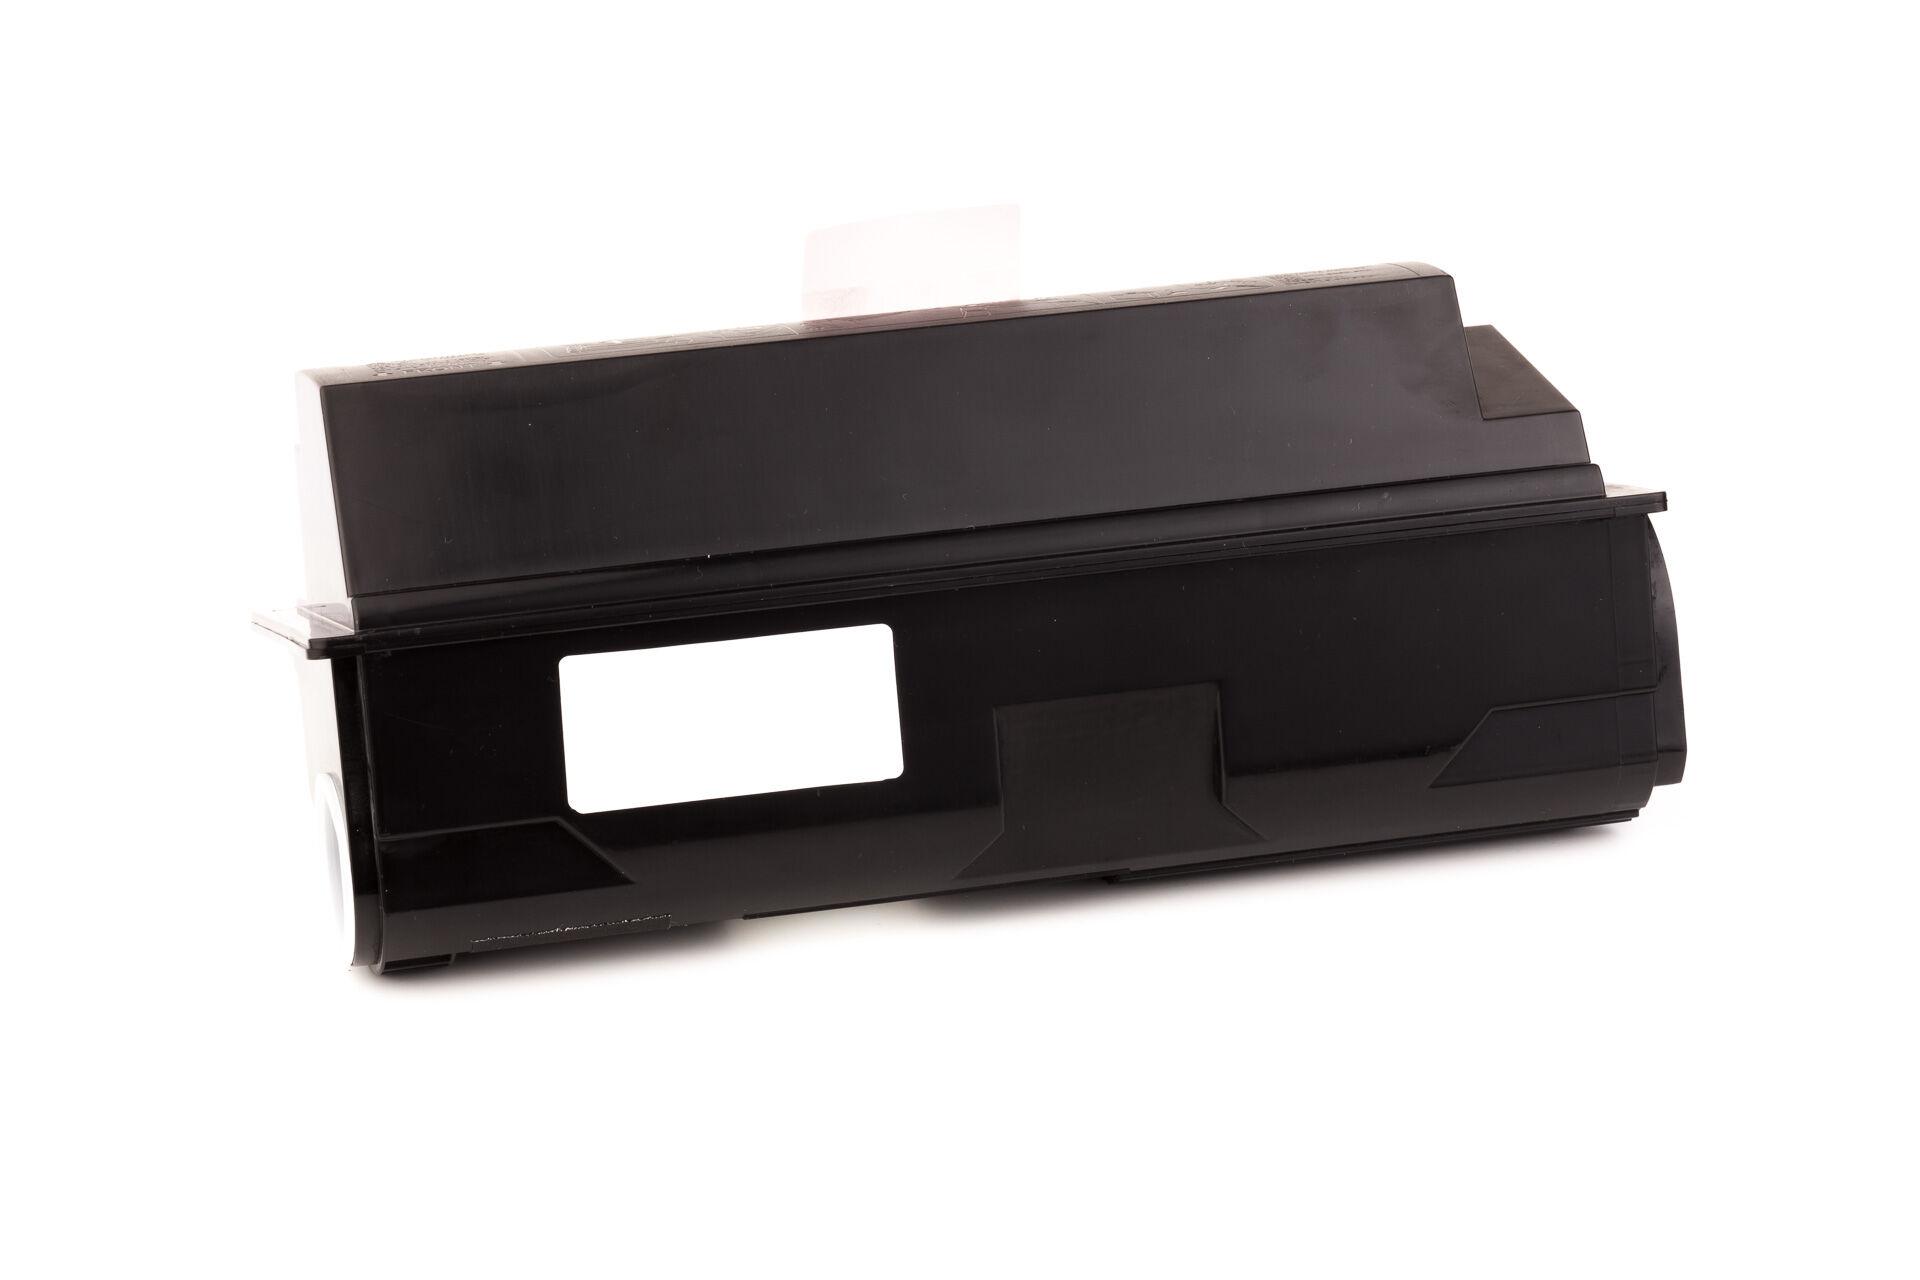 Kyocera Cartouche de Toner pour Kyocera 1T02GA0EU0 / TK-330 noir compatible (de marque ASC)